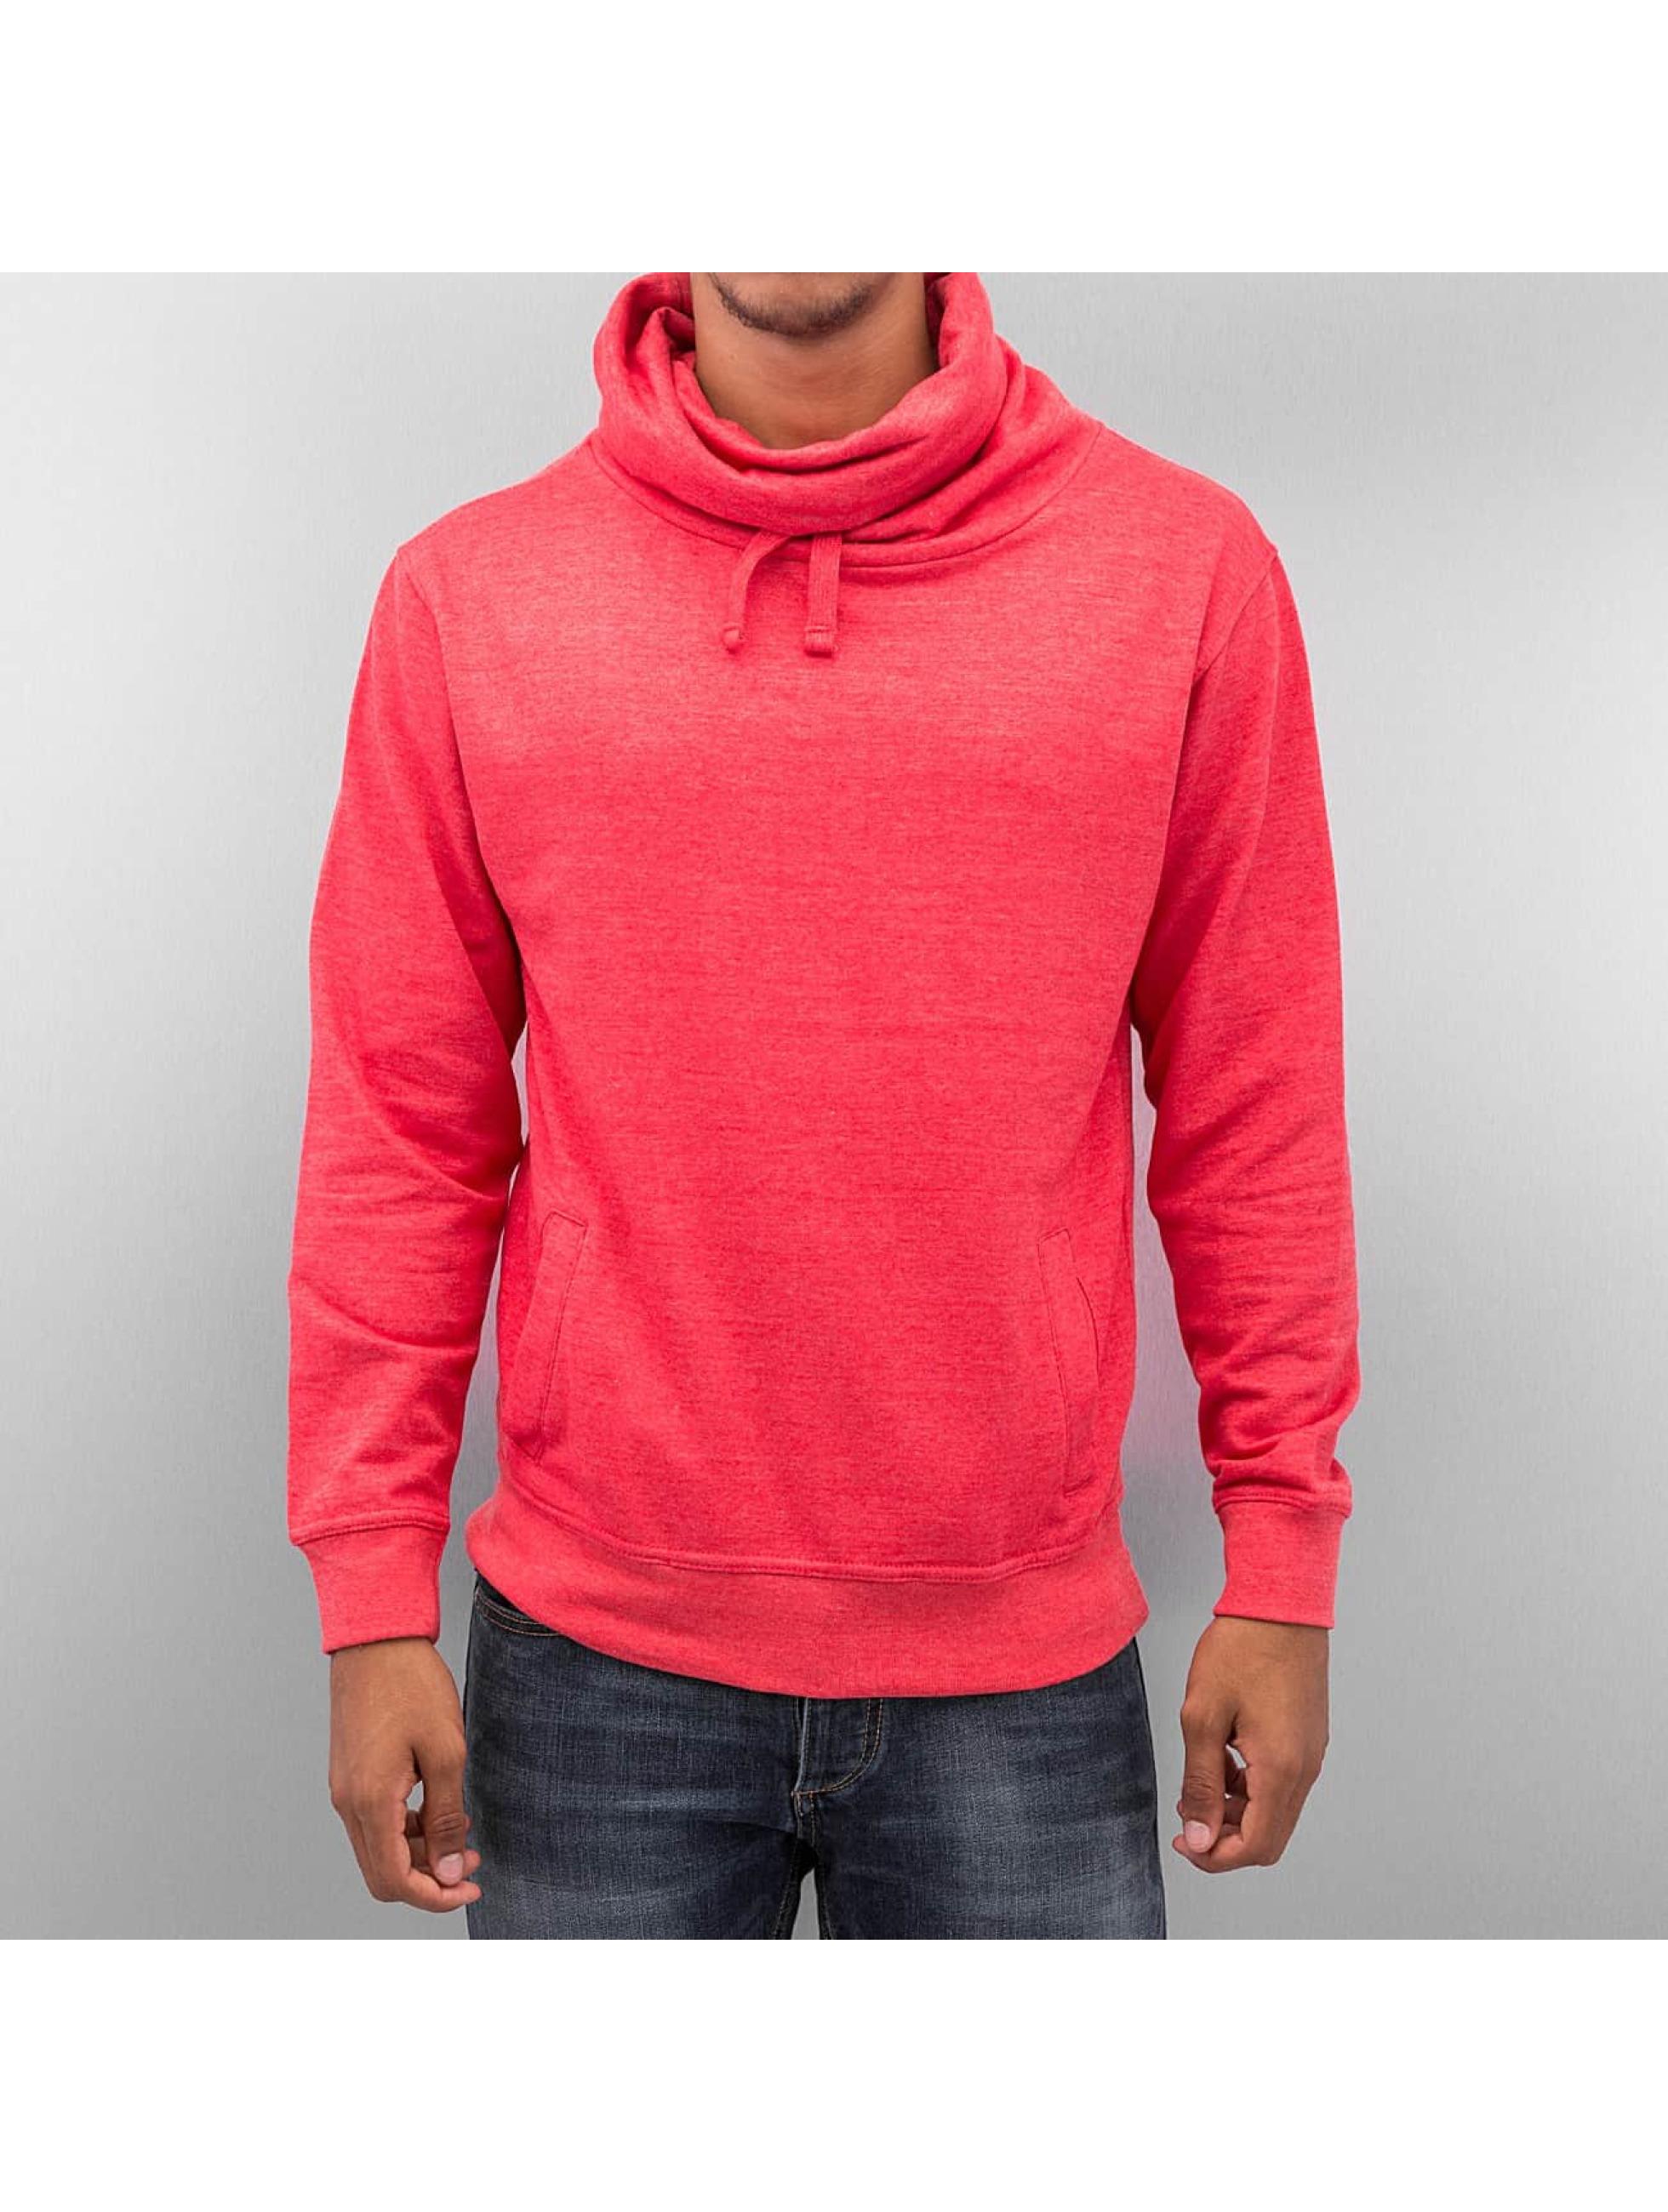 Dehash Männer Pullover Turtleneck in rot